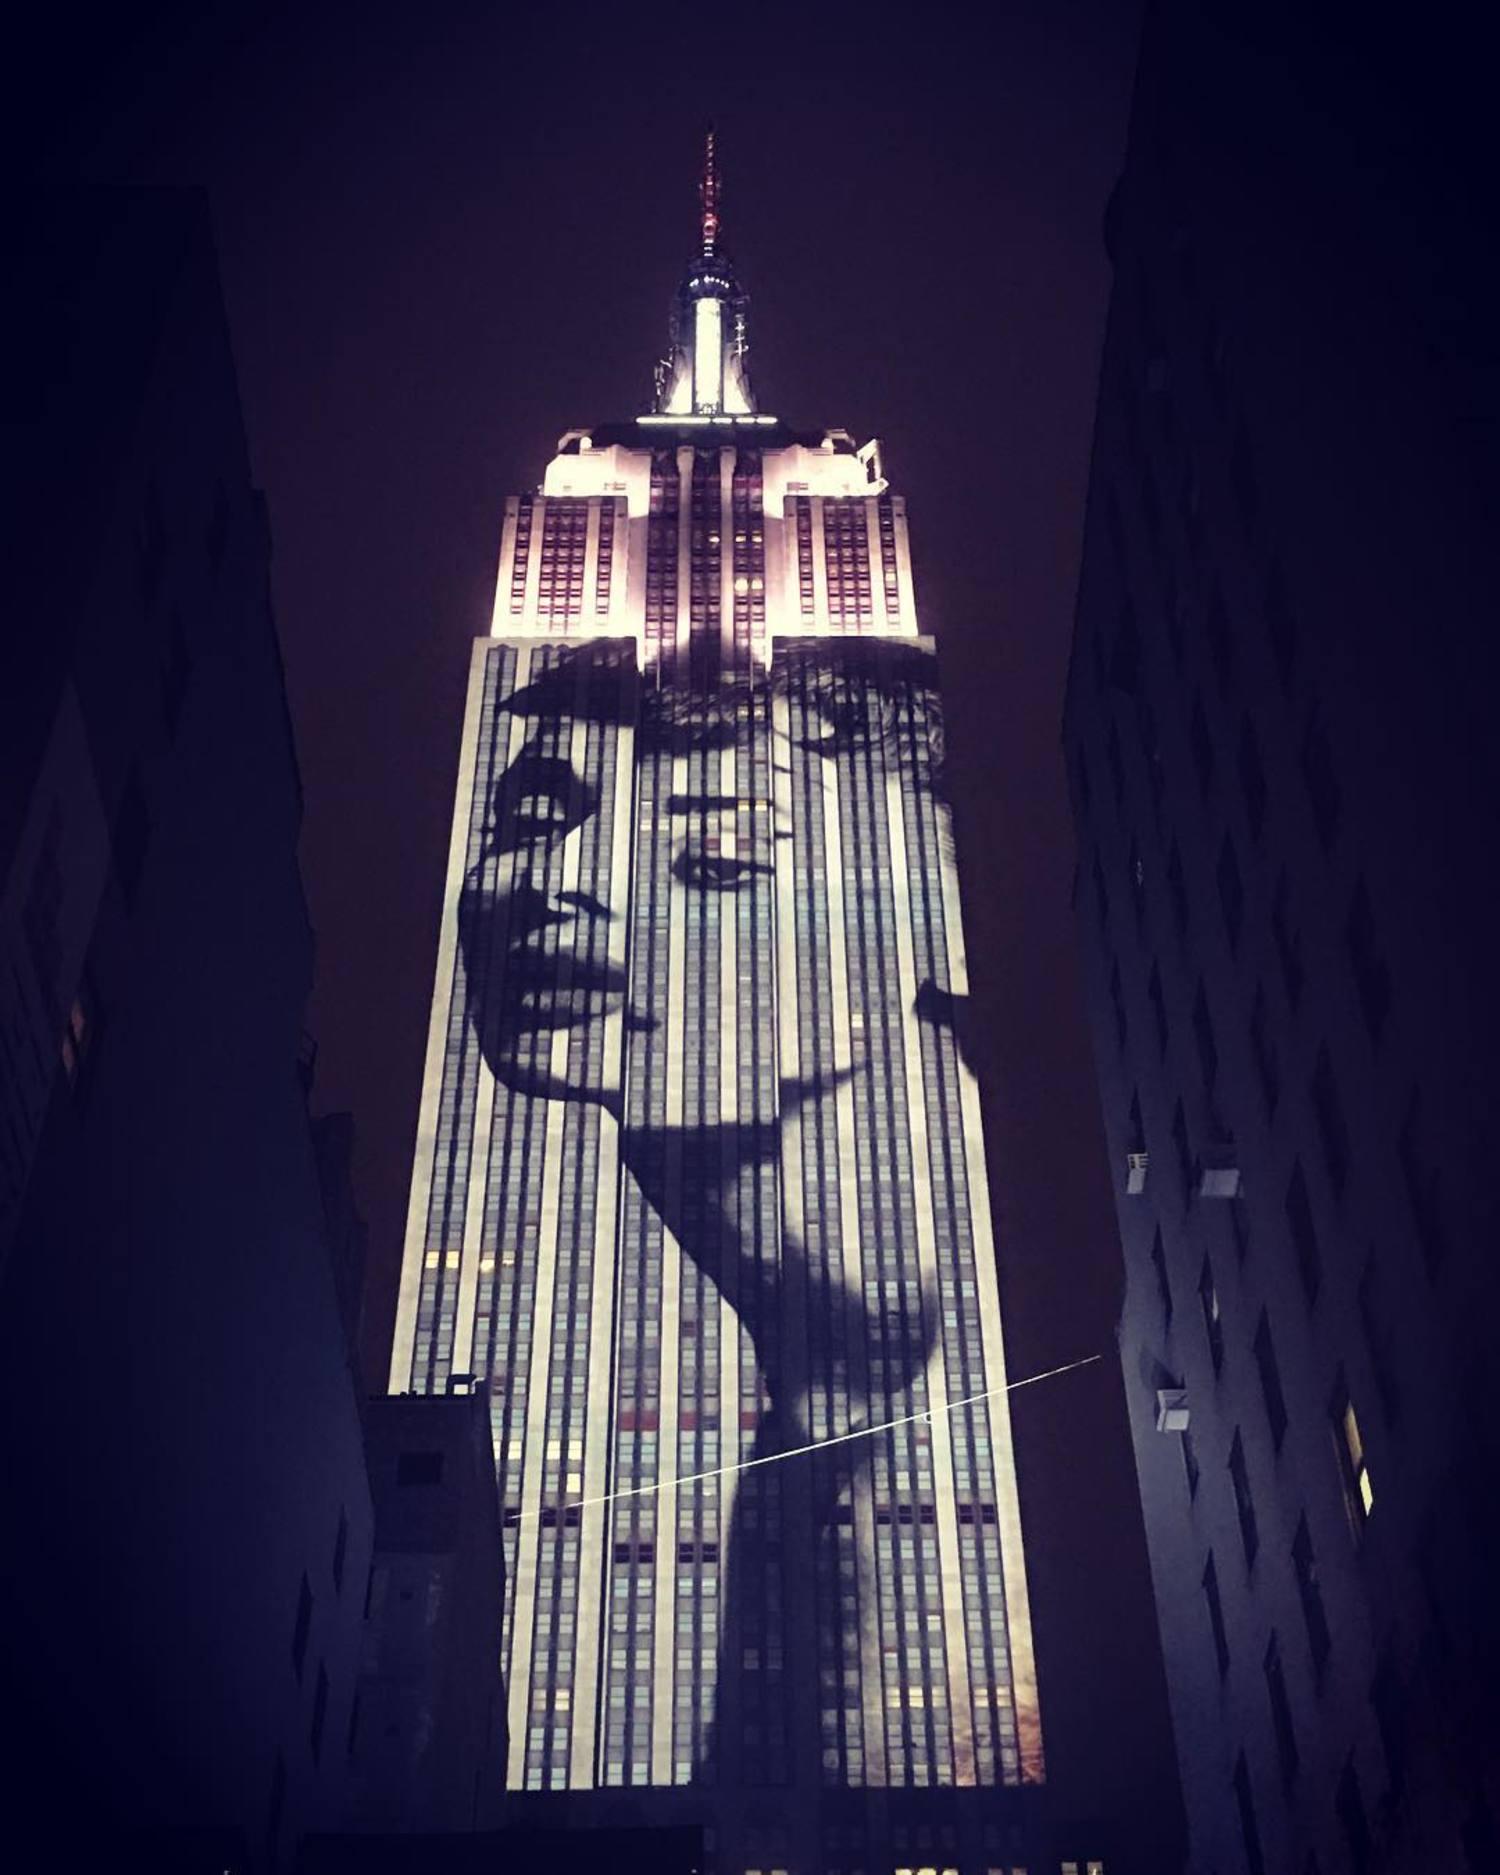 Audrey Hepburn - Harper's Bazaar 150th @harpersbazaarus #empirestatebuilding #harpersbazaar #BAZAAR150 #harpersbazaar150 #ny #nyc #newyork #manhattan #nbc4ny #abc7ny #nycprimeshot #nycprime_ladies #timeoutnewyork @tiffanyandco #tiffanyandco #audreyhepburn